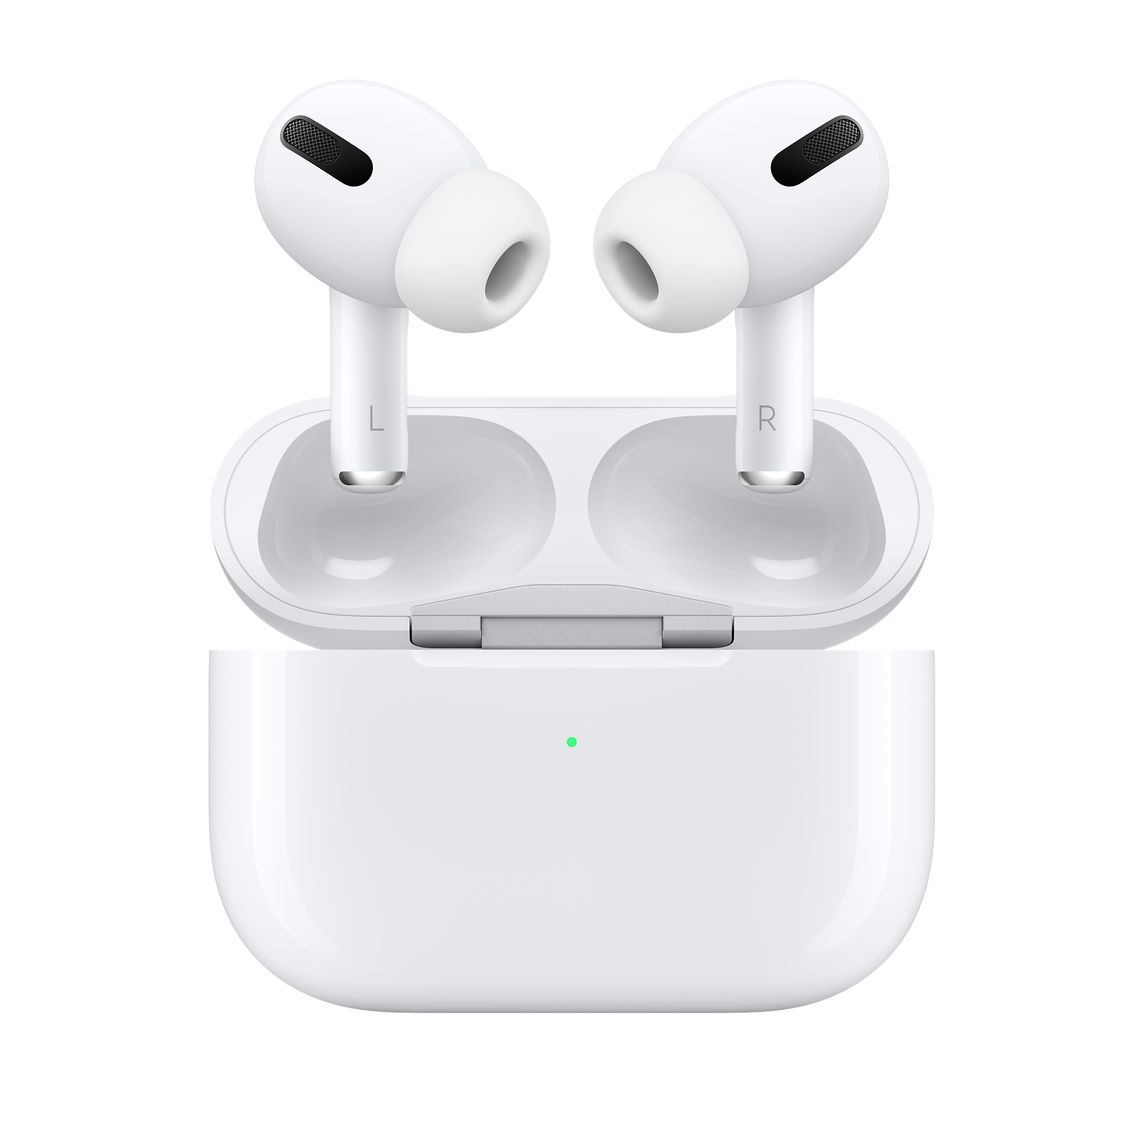 https://store.storeimages.cdn-apple.com/8567/as-images.apple.com/is/MWP22?wid=1144&hei=1144&fmt=jpeg&qlt=80&op_usm=0.5,0.5&.v=1572990352299